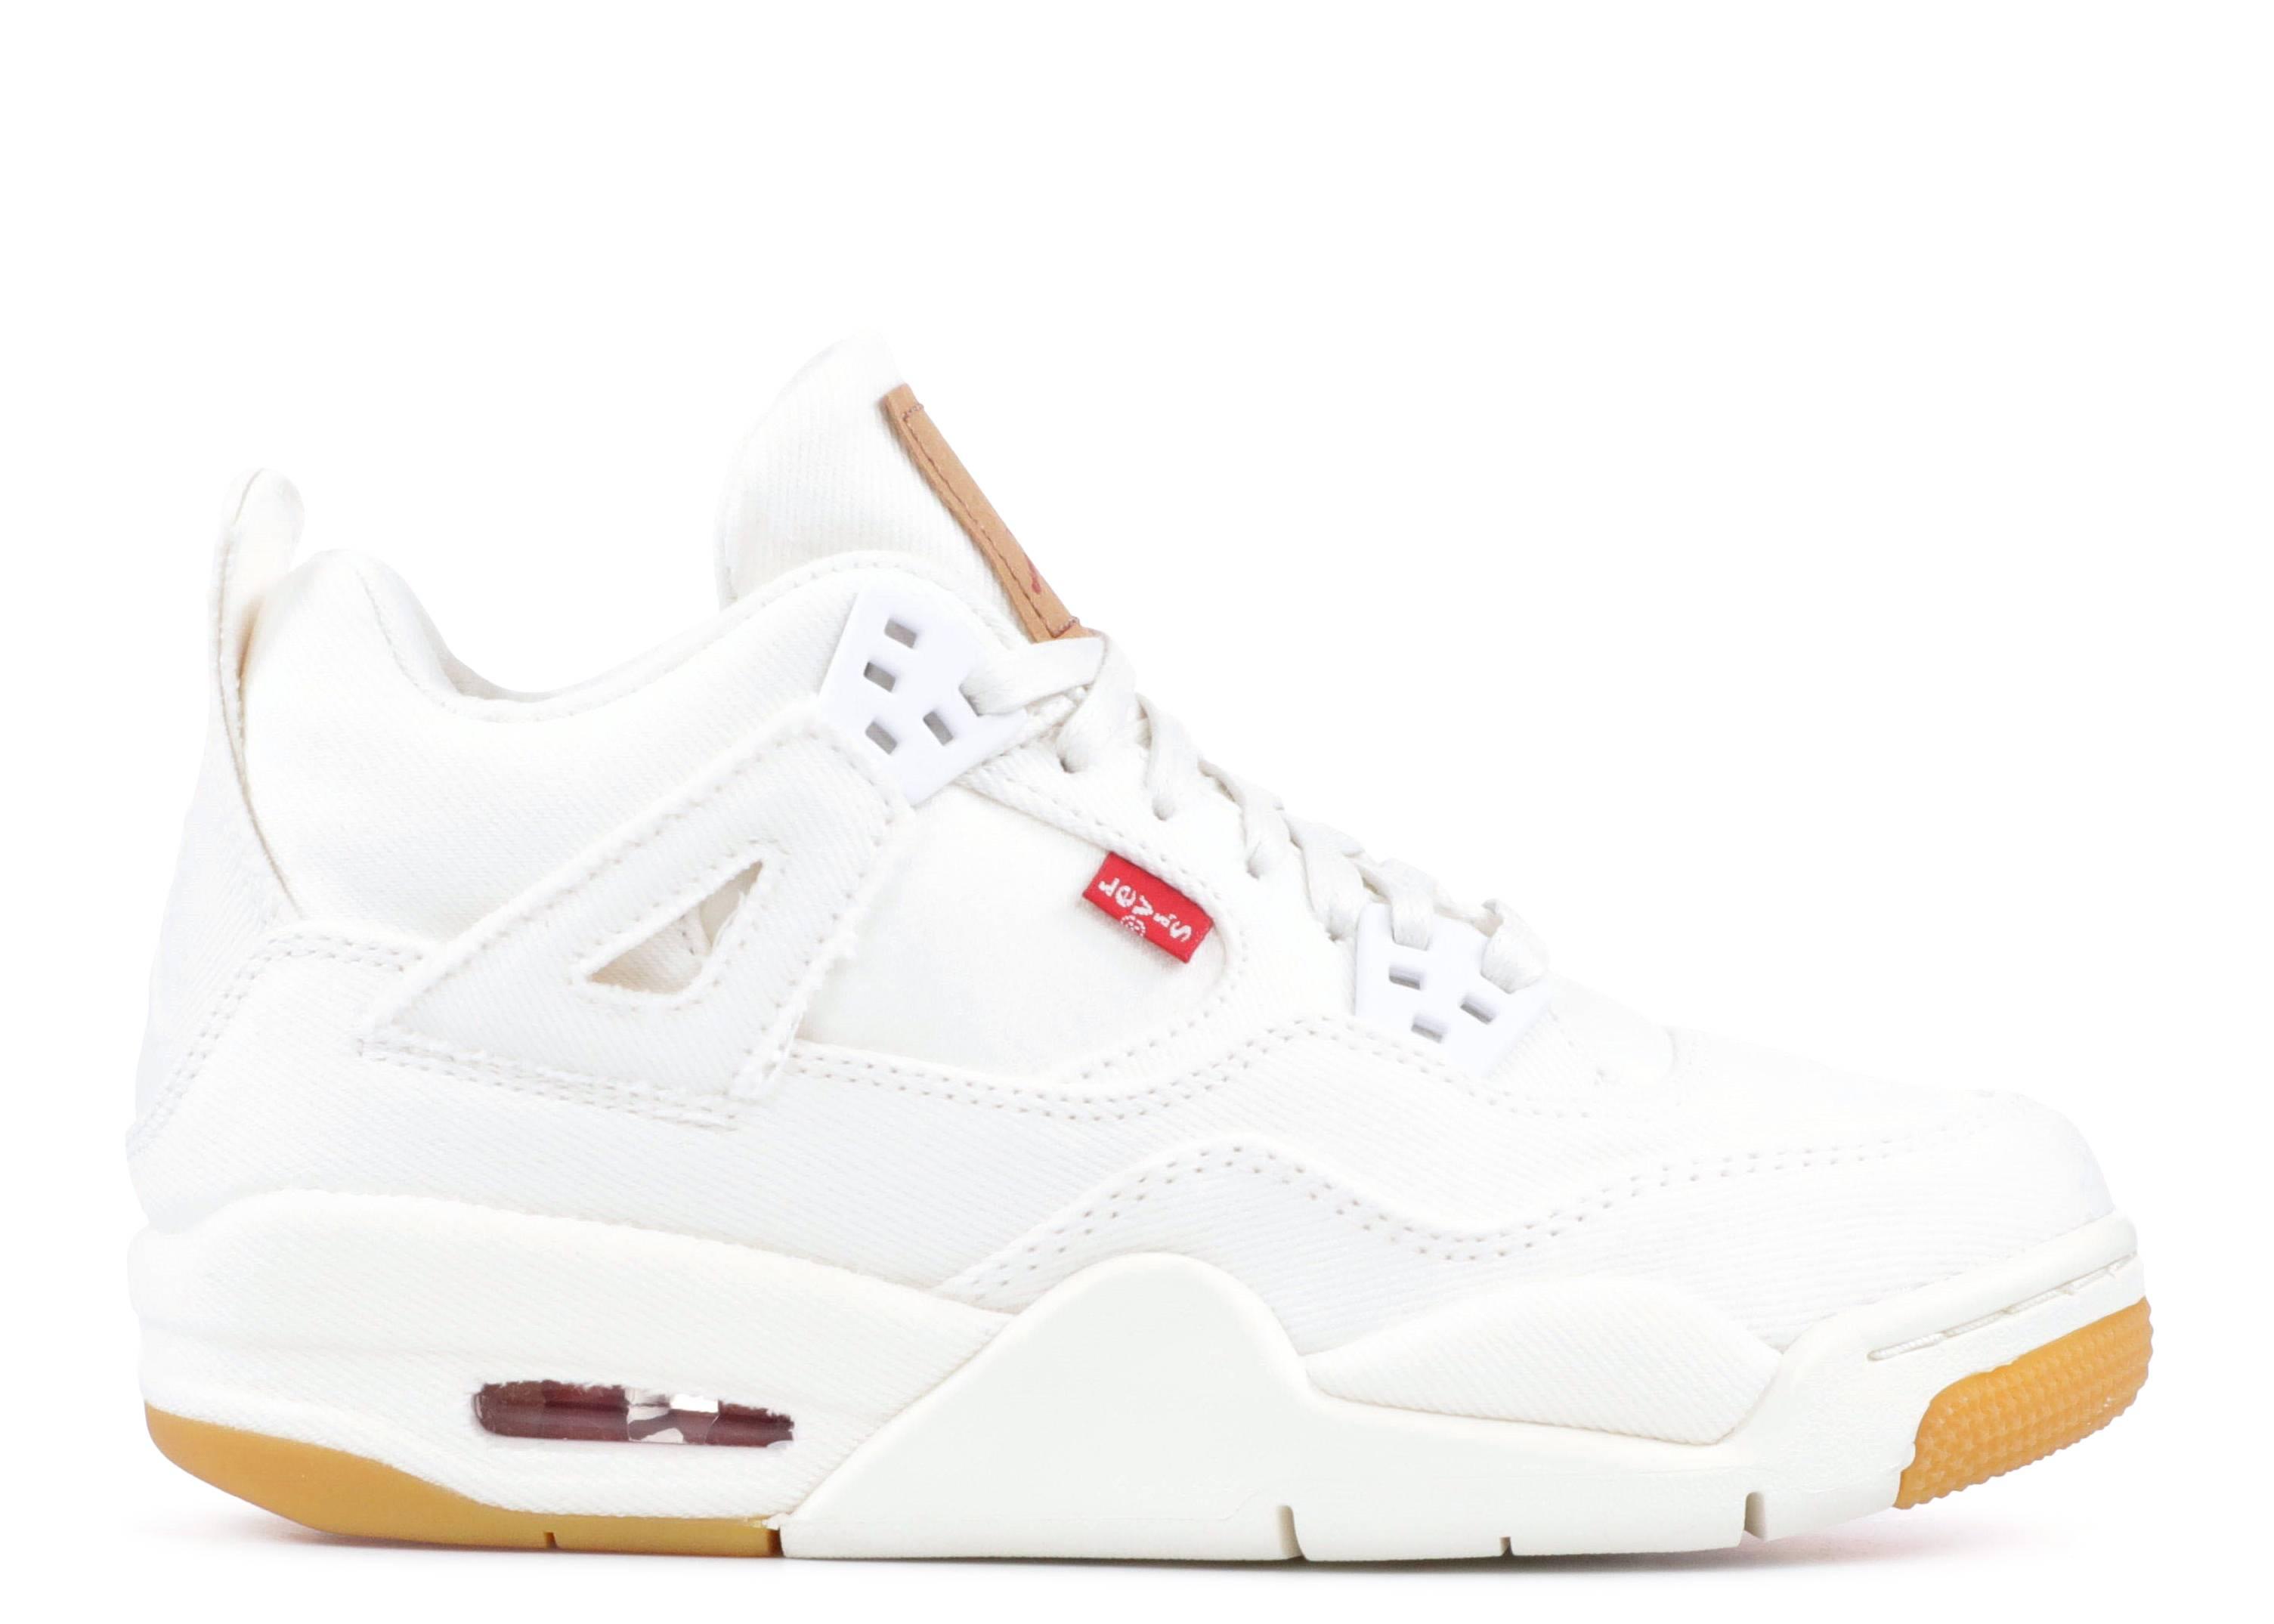 online store 7c9db 4507a Levi's x Air Jordan 4 Retro GS 'White Denim'